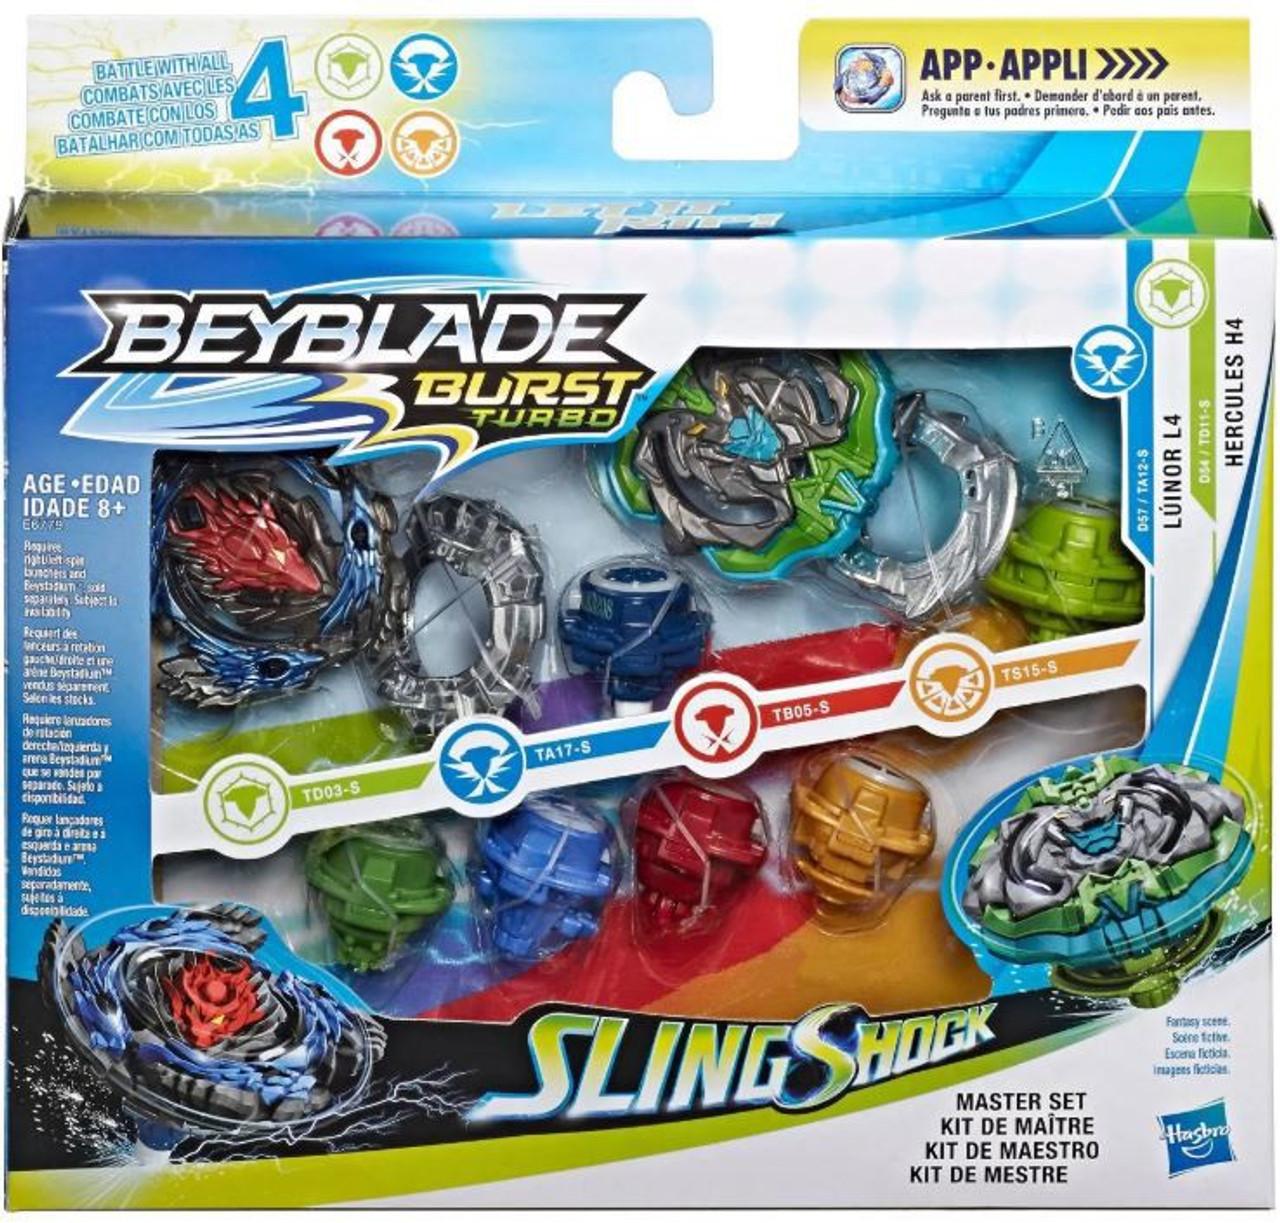 Beyblade Burst Turbo Slingshock Master Set Pack Hasbro Toys